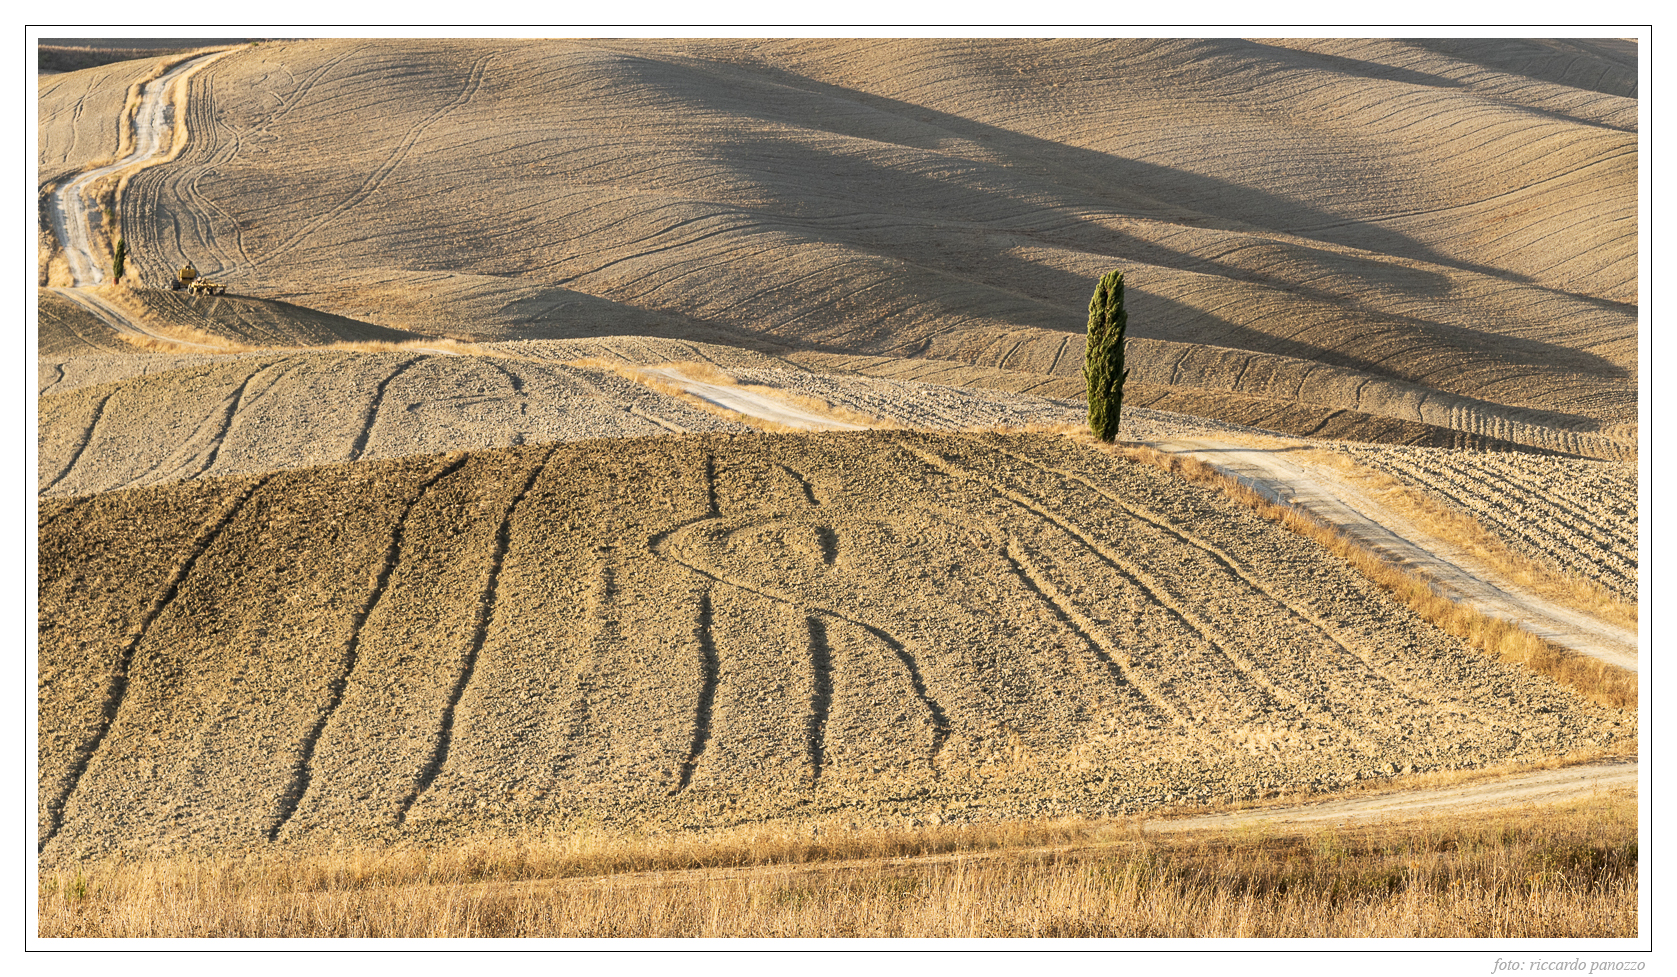 TOSCANA - Siena e Val d'Orcia,